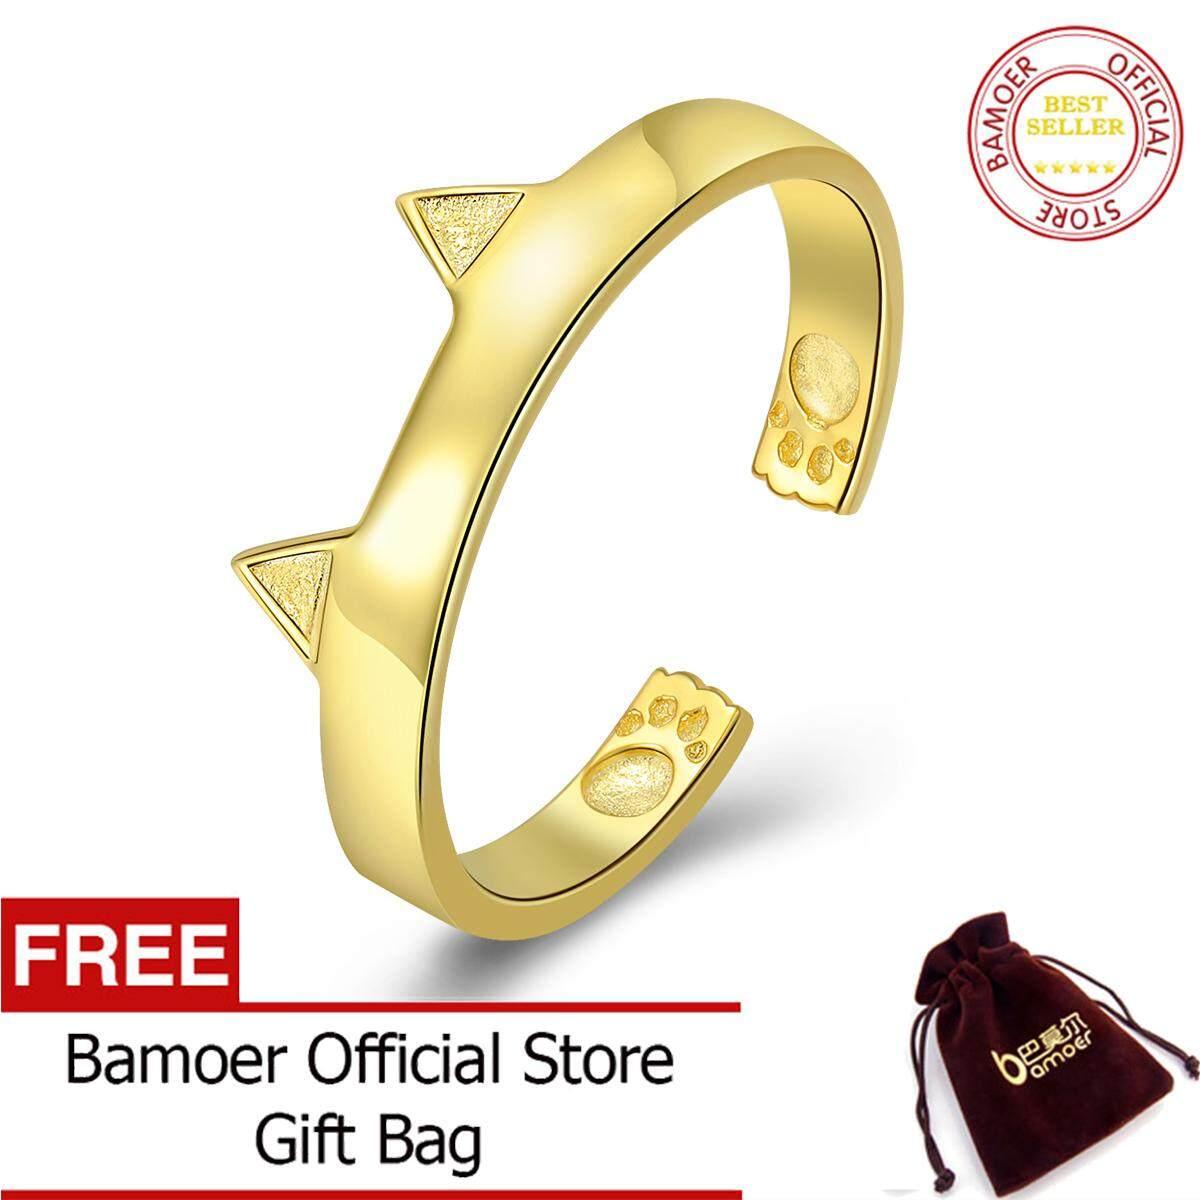 Bamoer Gratis Shpping 100 925 Perak Berkilau Agustus 3 Warna Kucing Telinga Hewan Disesuaikan